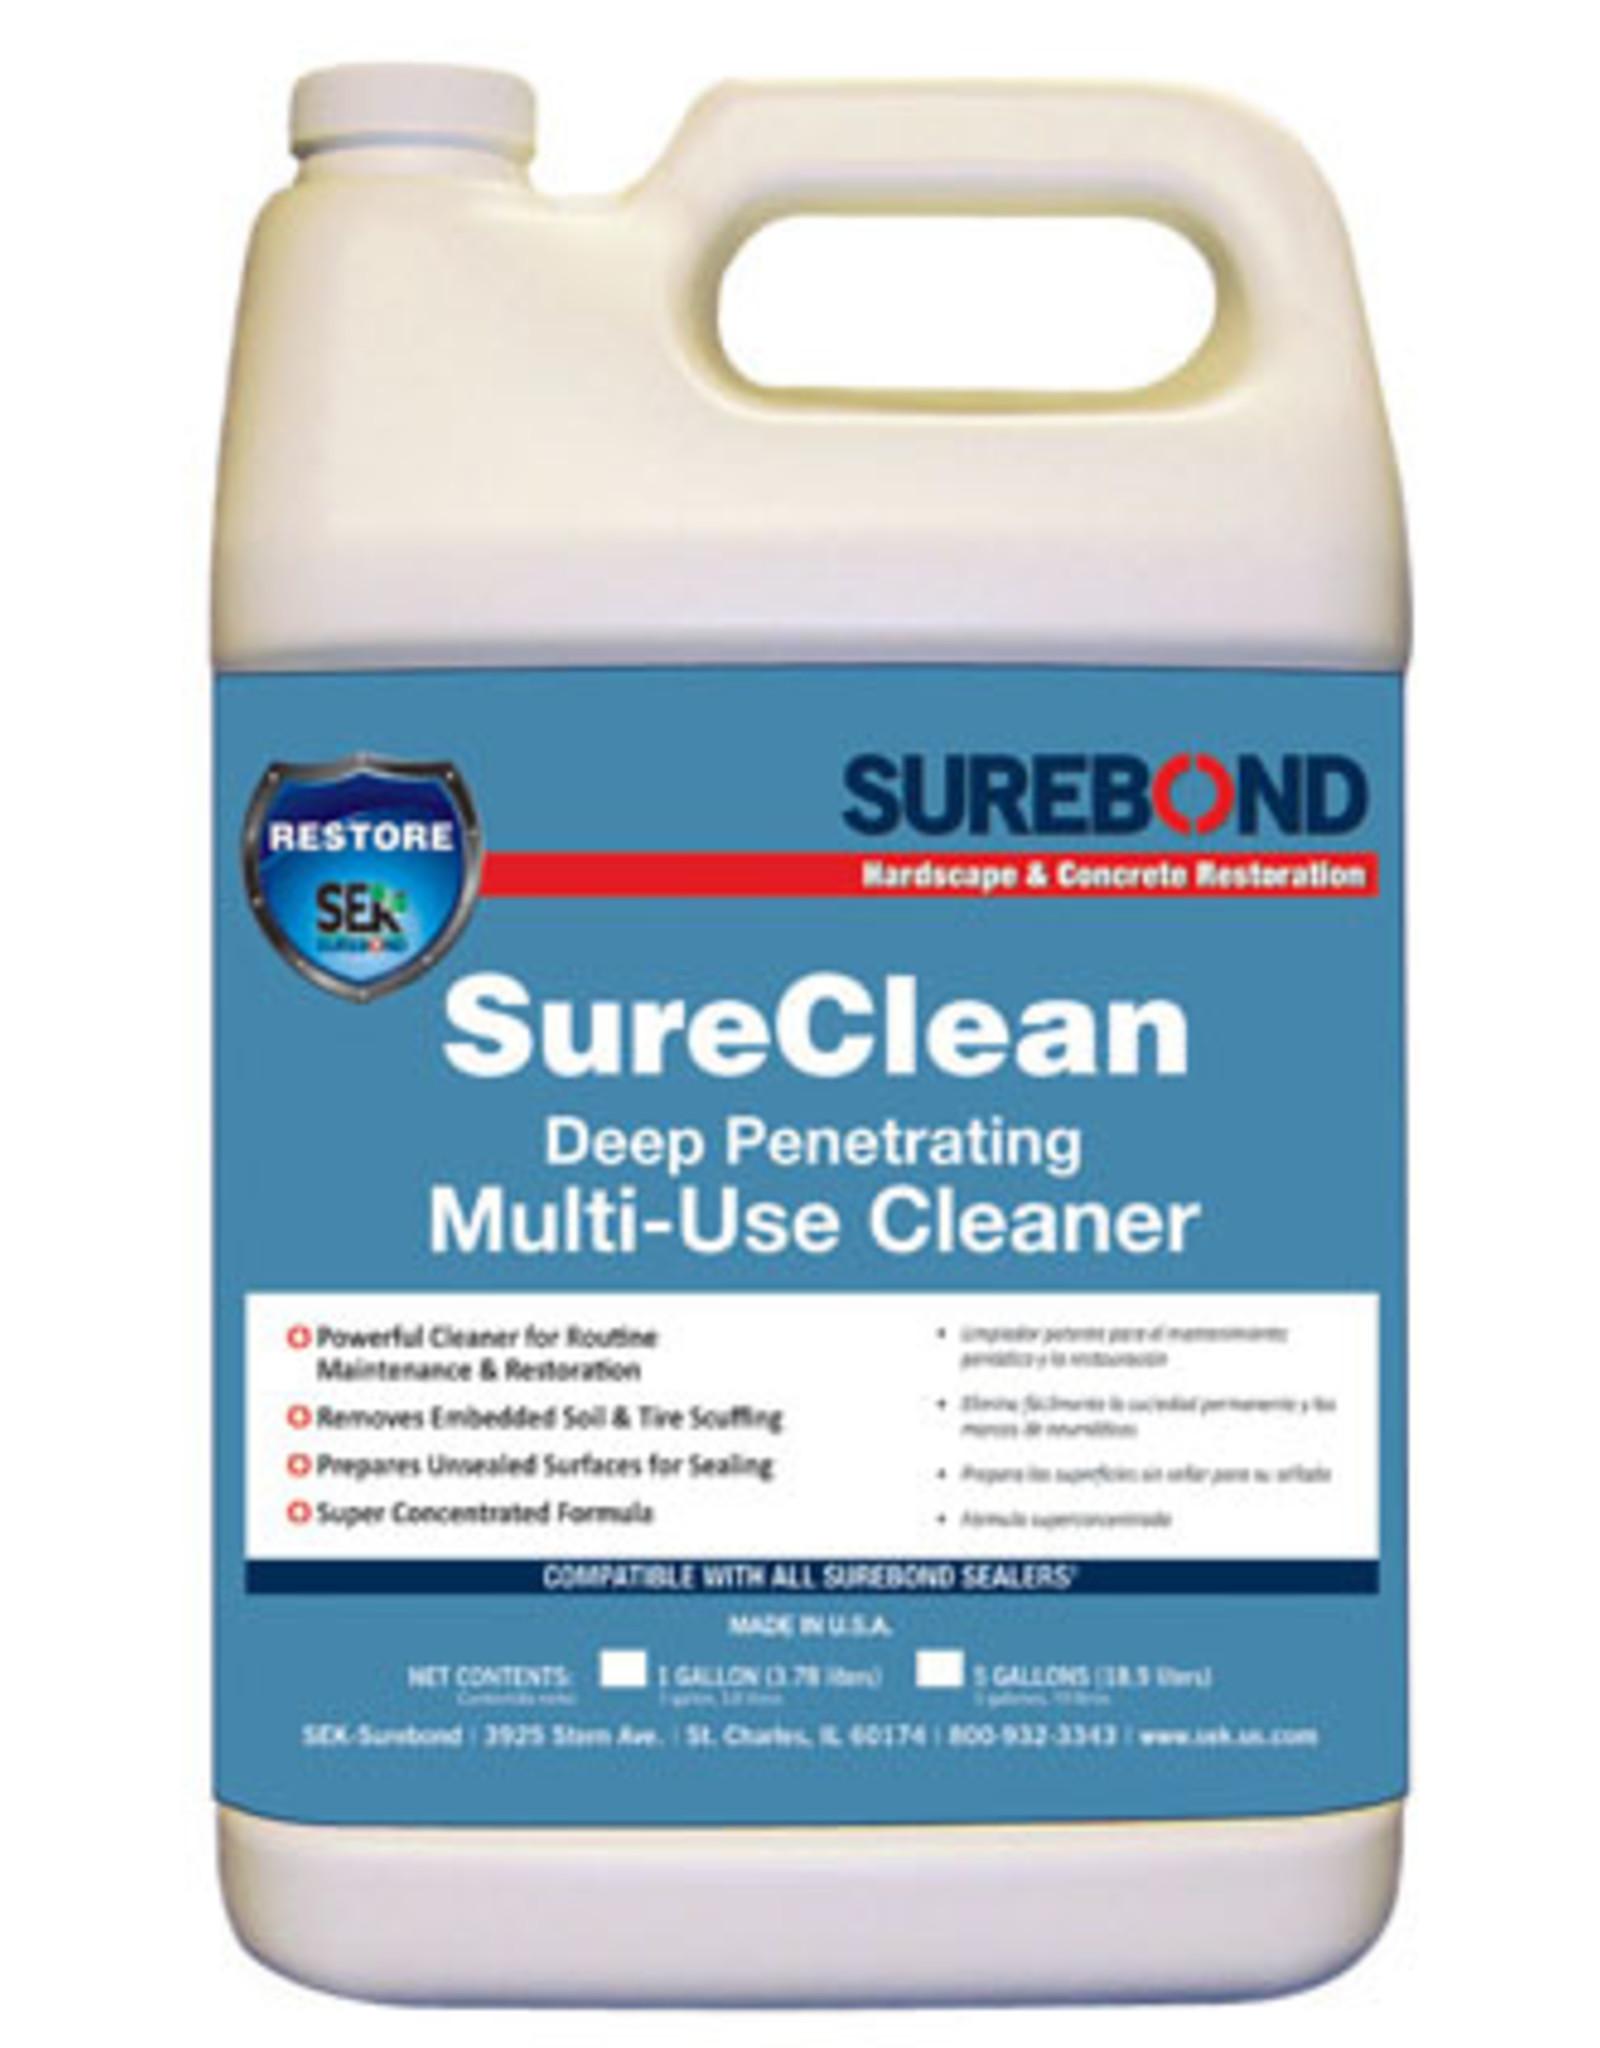 SEK Surebond SureClean Deep Penetrating Multi-Use Cleaner, Gallon